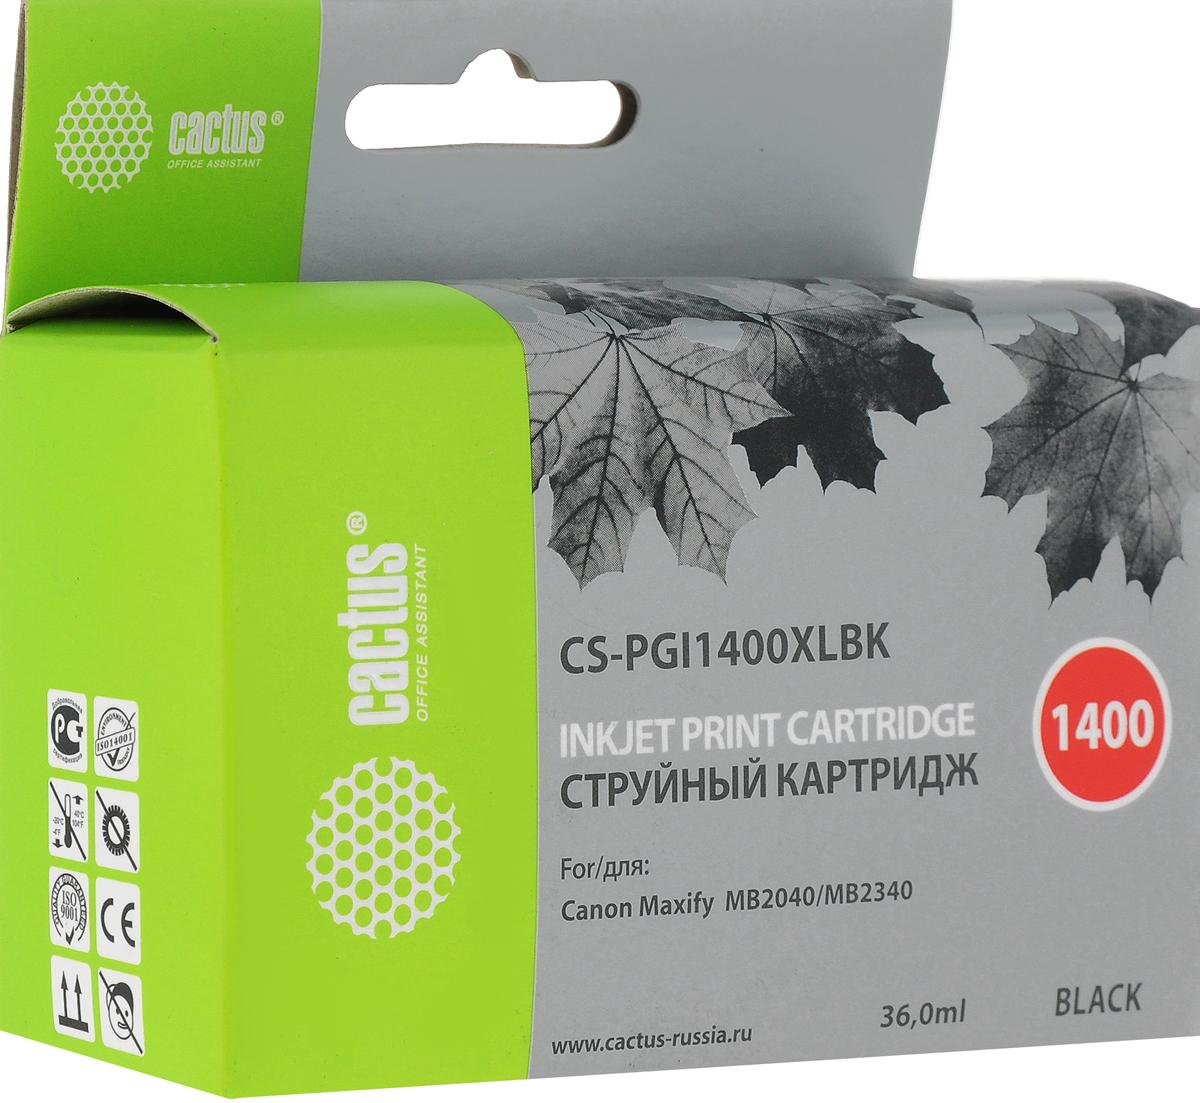 Cactus CS-PGI1400XLBK, Black картридж струйный для Canon MB2050/MB2350/MB2040/MB2340 картридж для принтера и мфу cactus cs ept0481 black